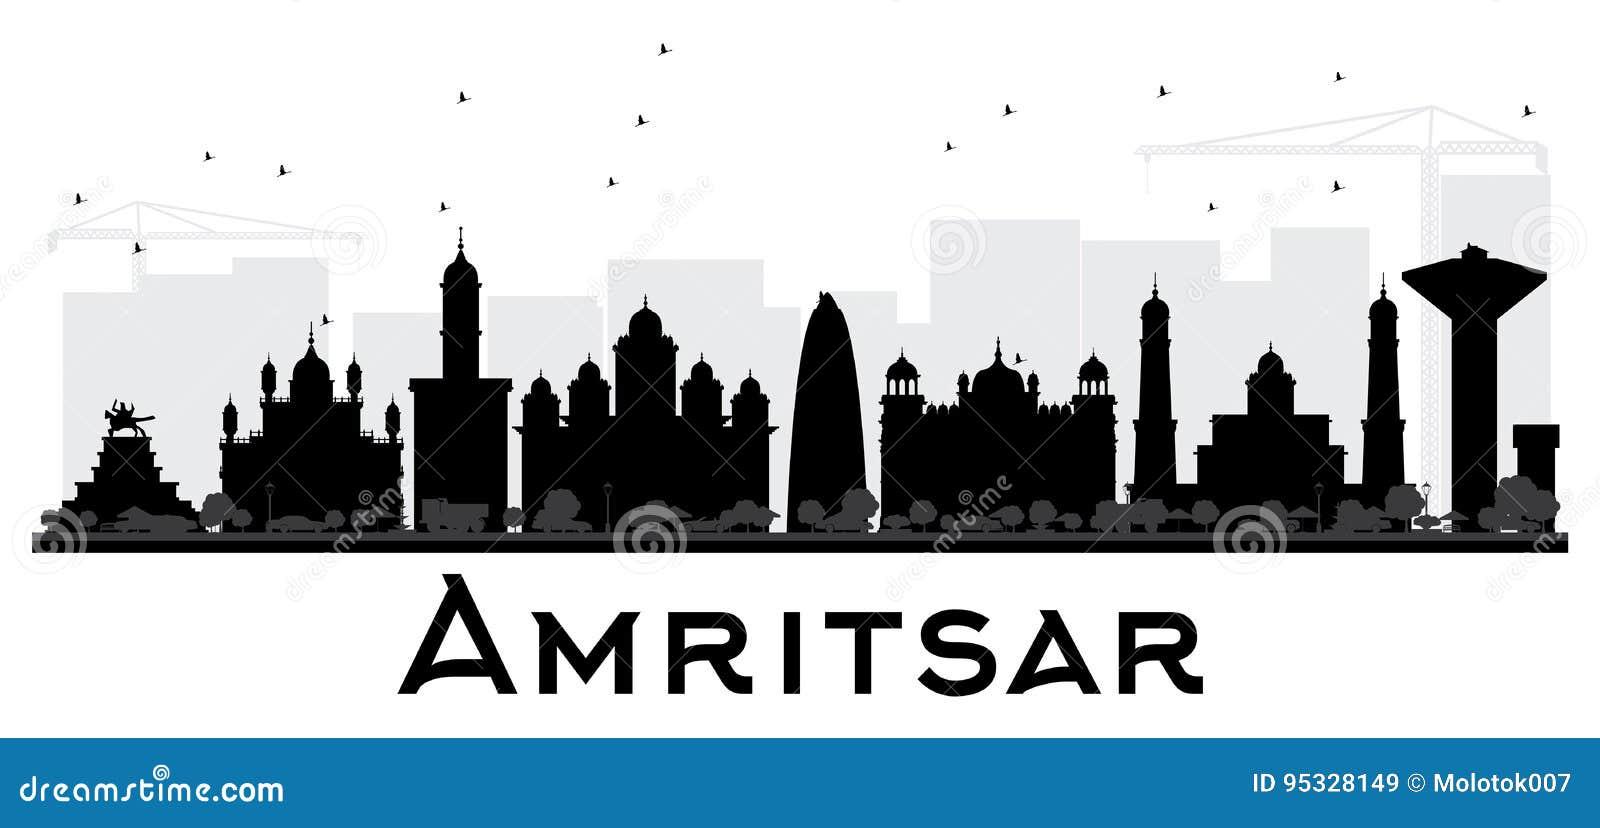 Dating amritsar